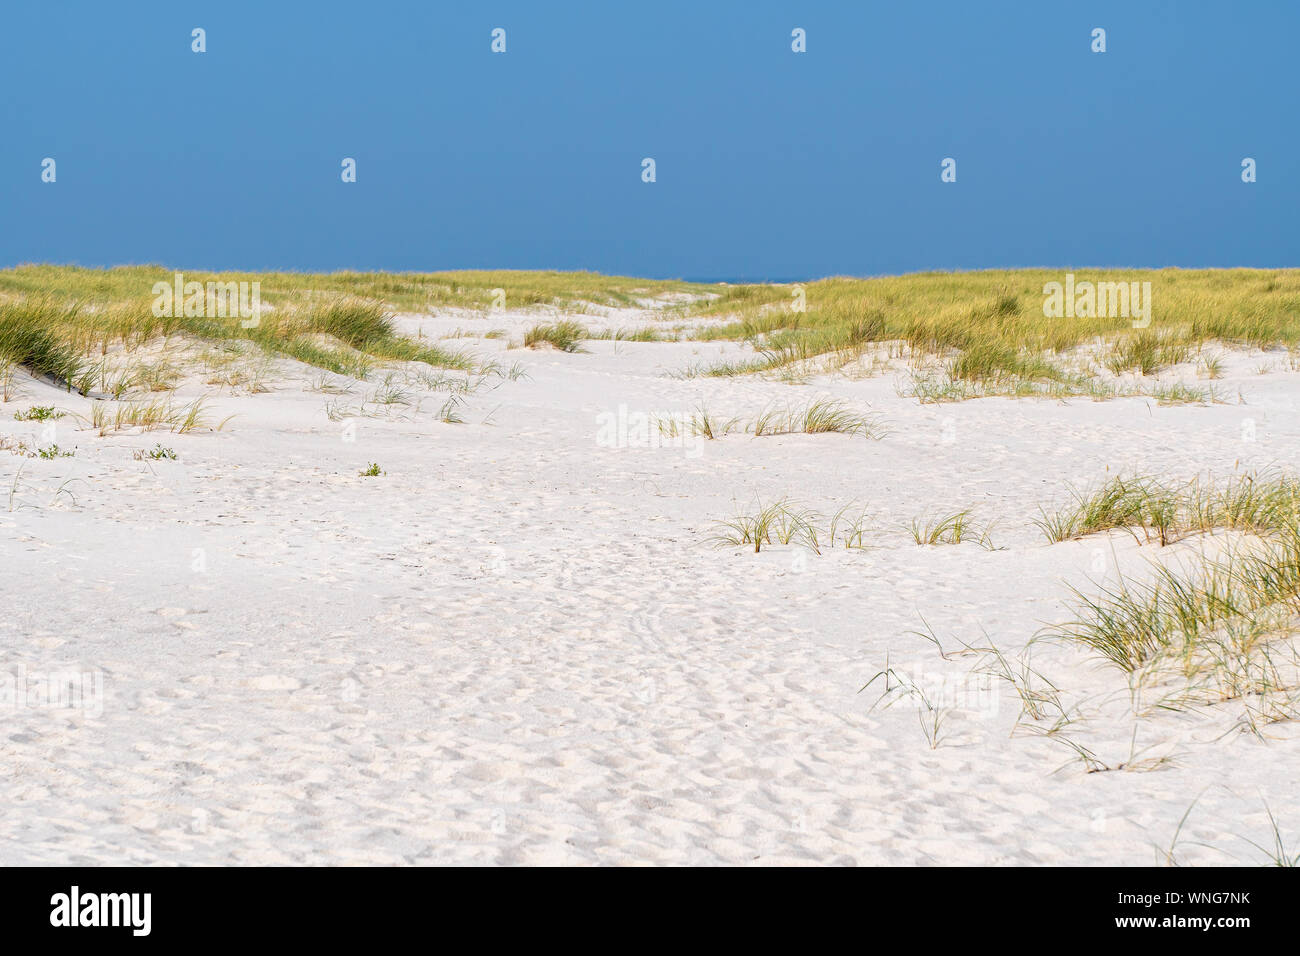 Dunes On The Island Sylt Germany Stock Photo 271420623 Alamy